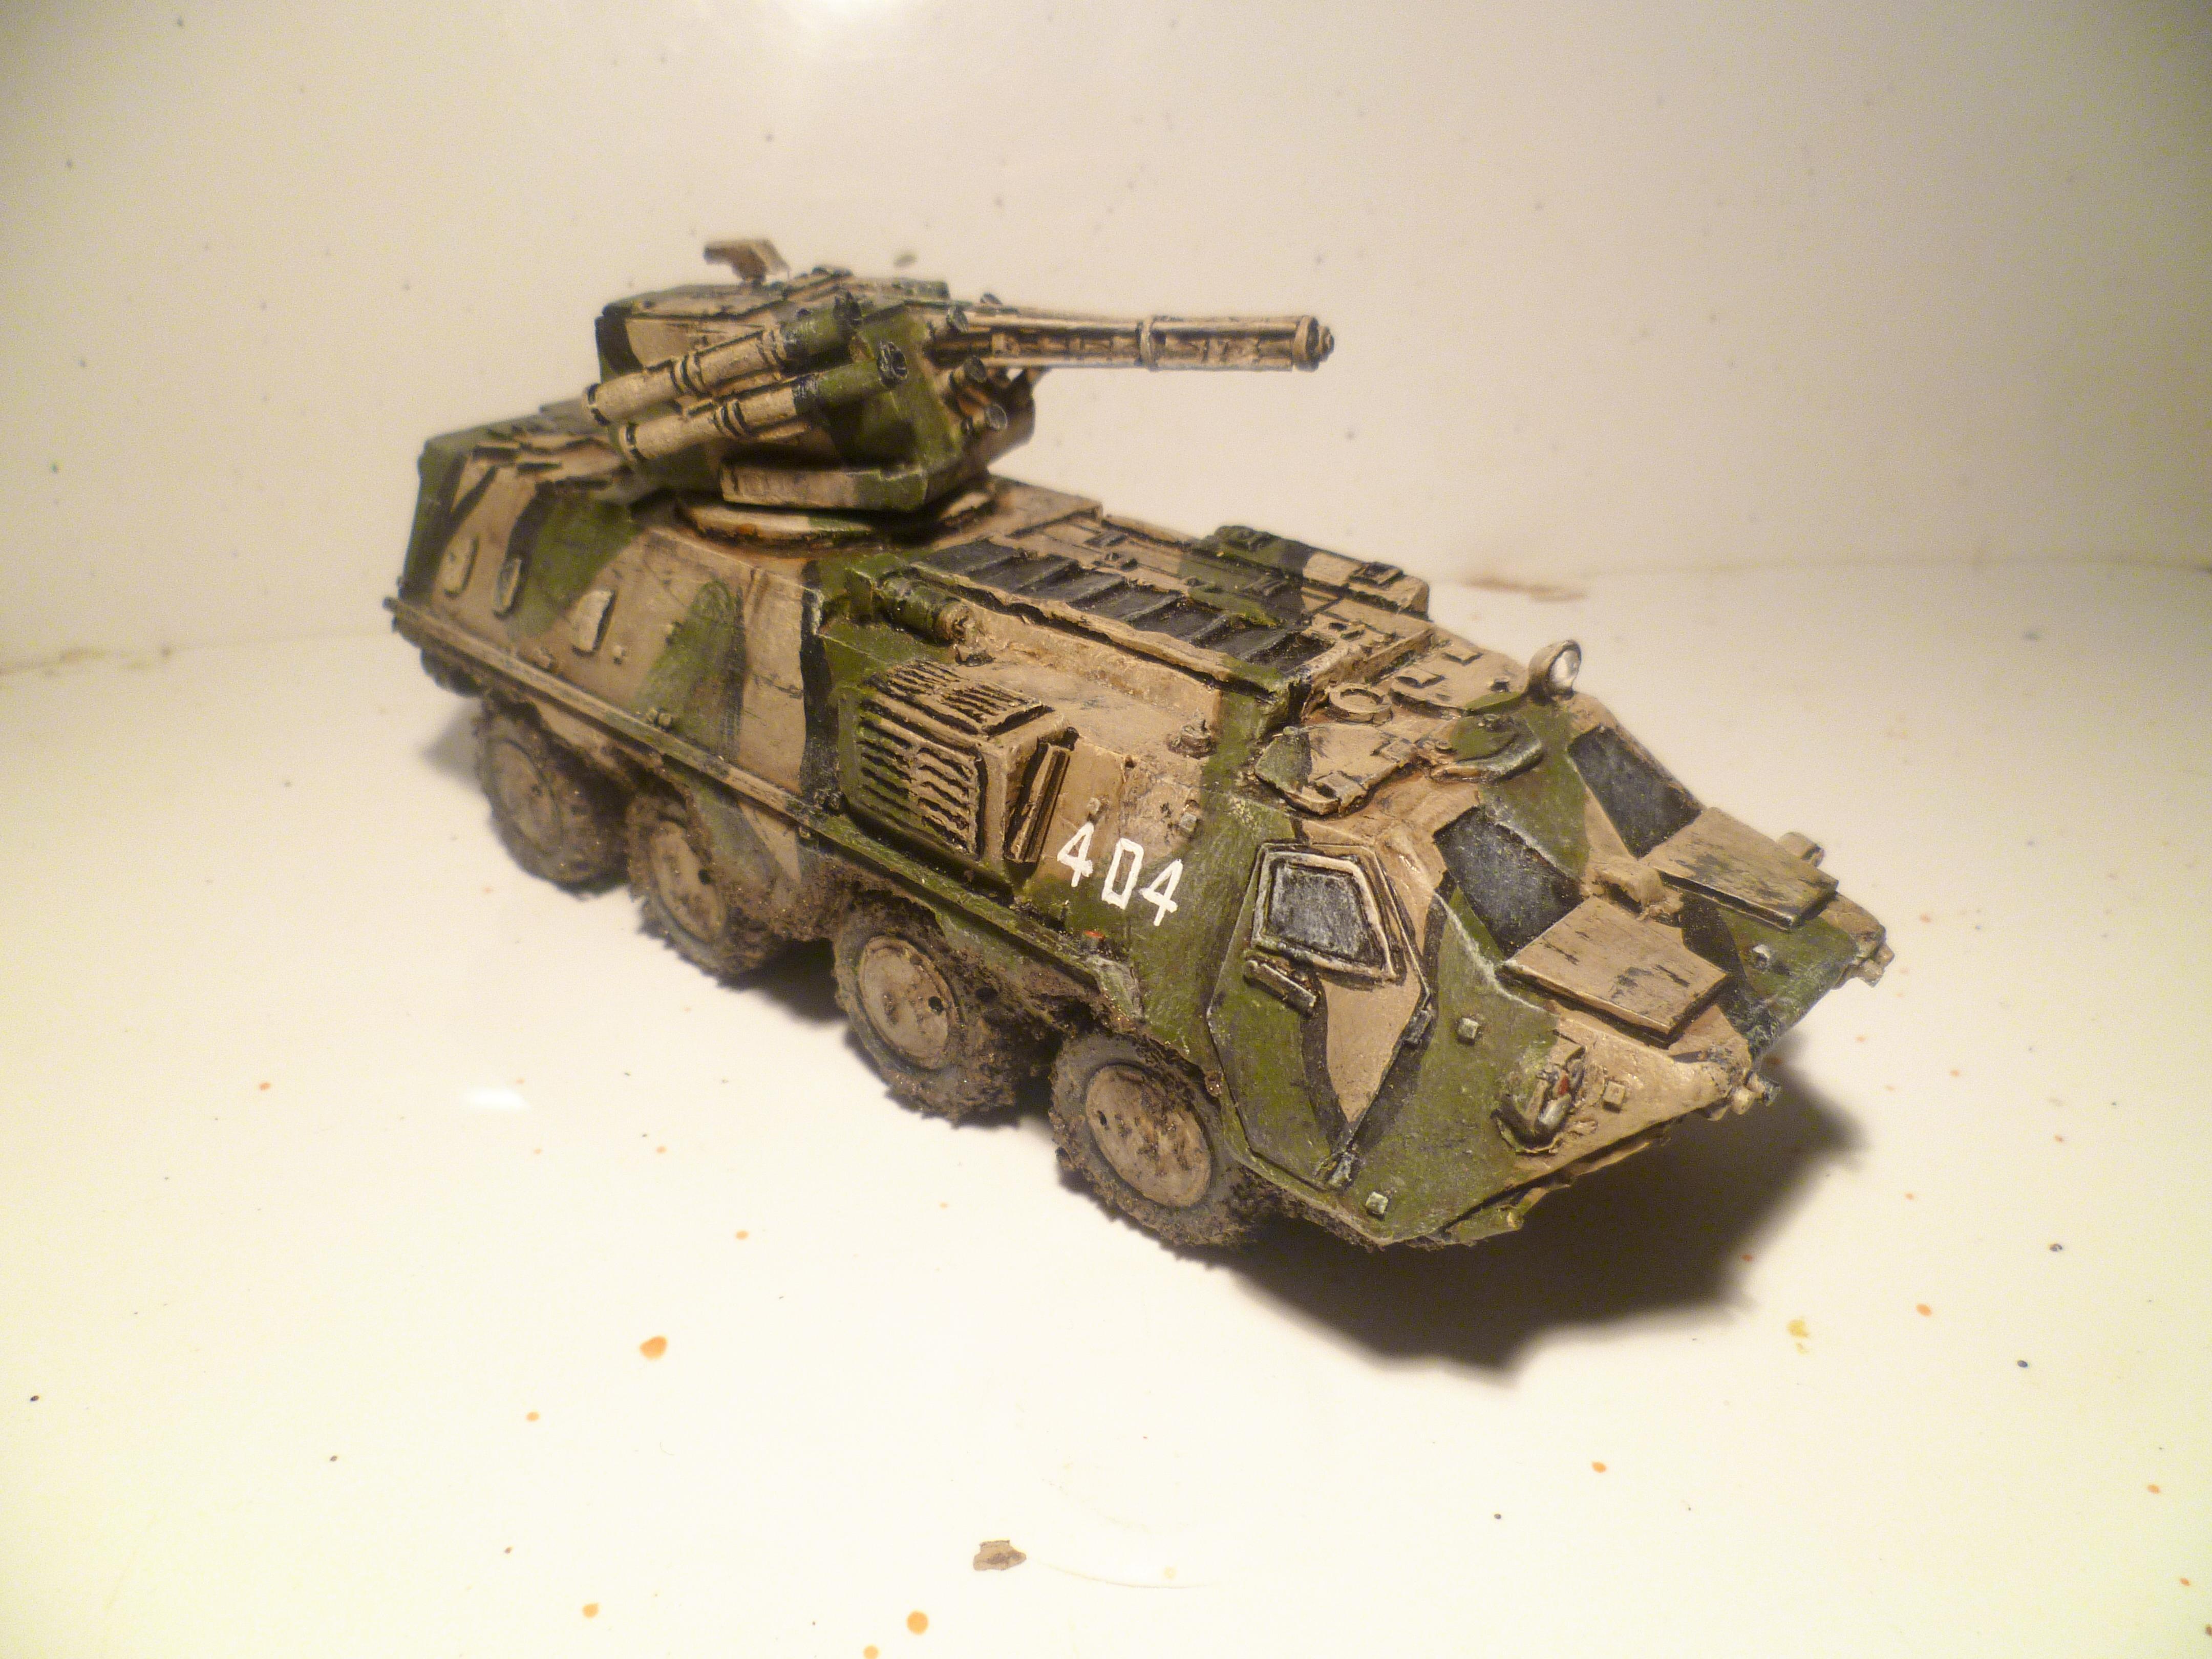 28mm, Apc, Armored, Btr-4, Built, Conversion, Eastern European, Ifv, Modern, Russians, Scratch, Ukrainian, Vehicle